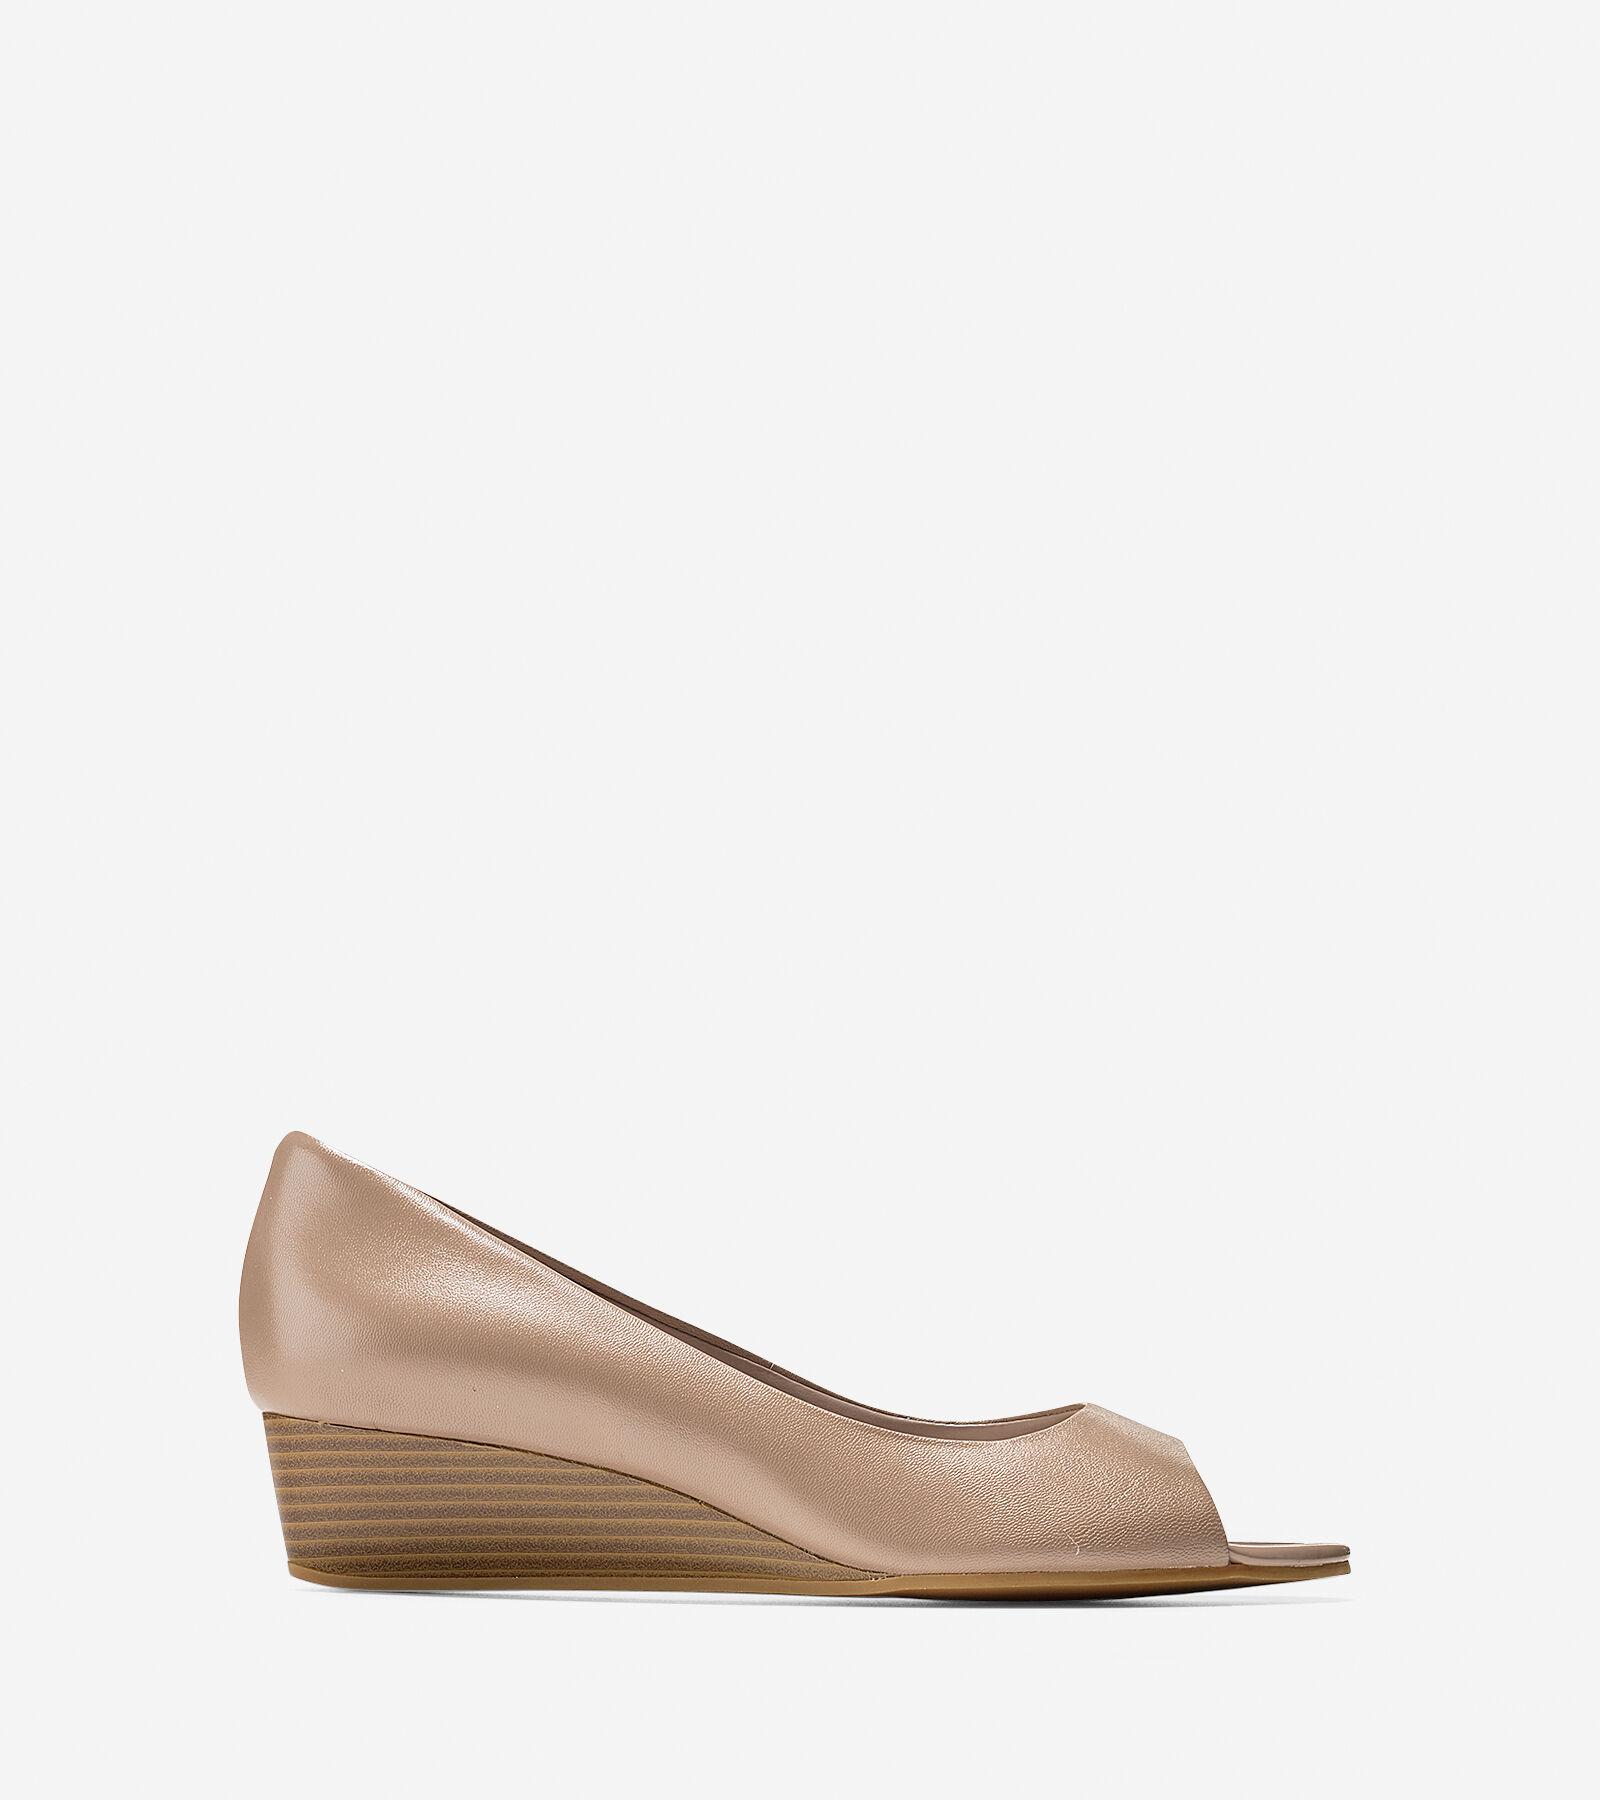 Womens Shoes Cole Haan Elsie Open Toe Wedge II Maple Sugar